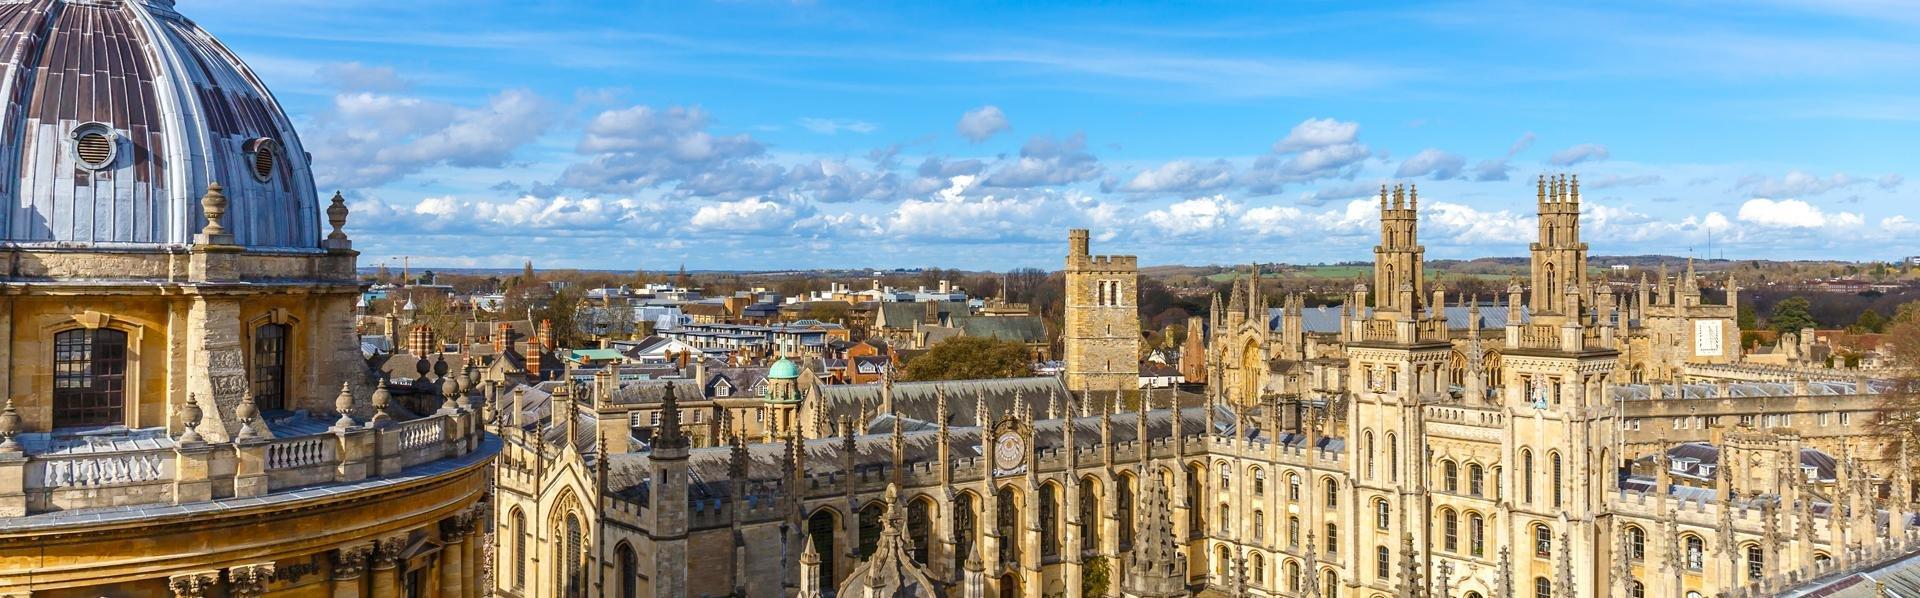 Universiteit van Oxford in Groot-Brittannië